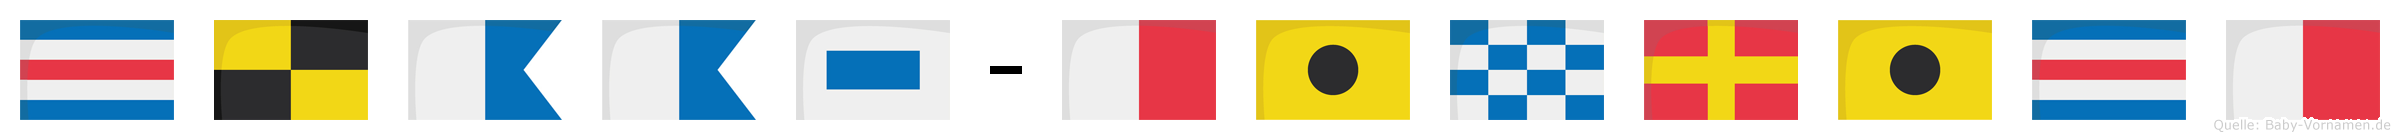 Claas-Hinrich im Flaggenalphabet